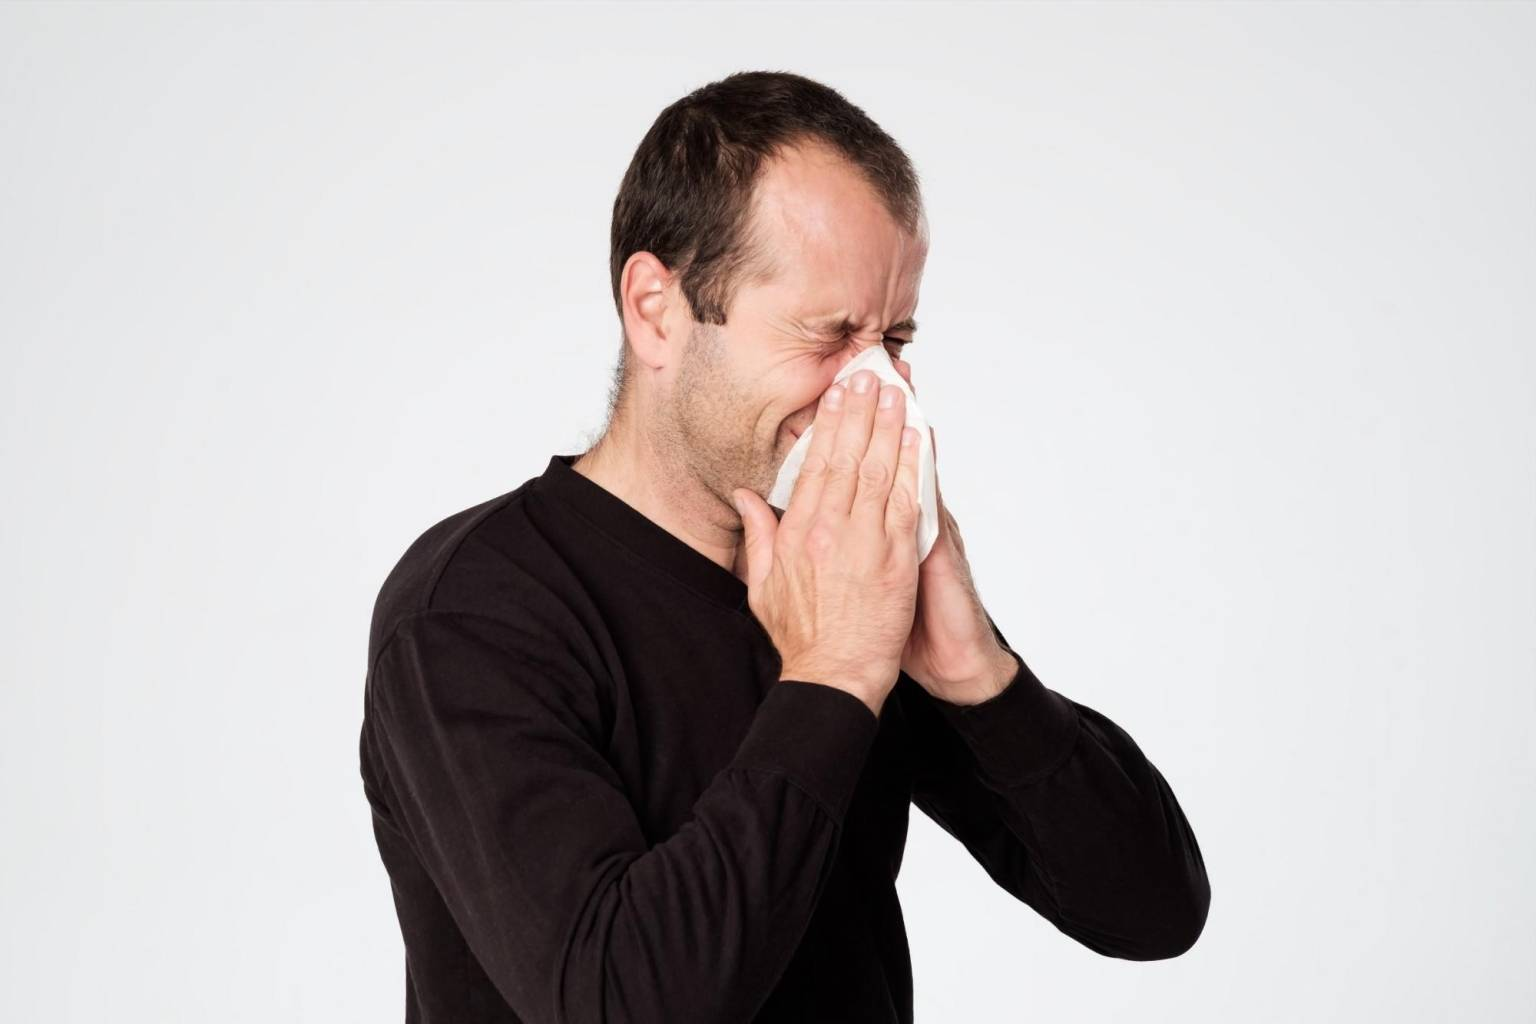 Polvo del Sahara provoca enfermedades respiratorias, afirma experto